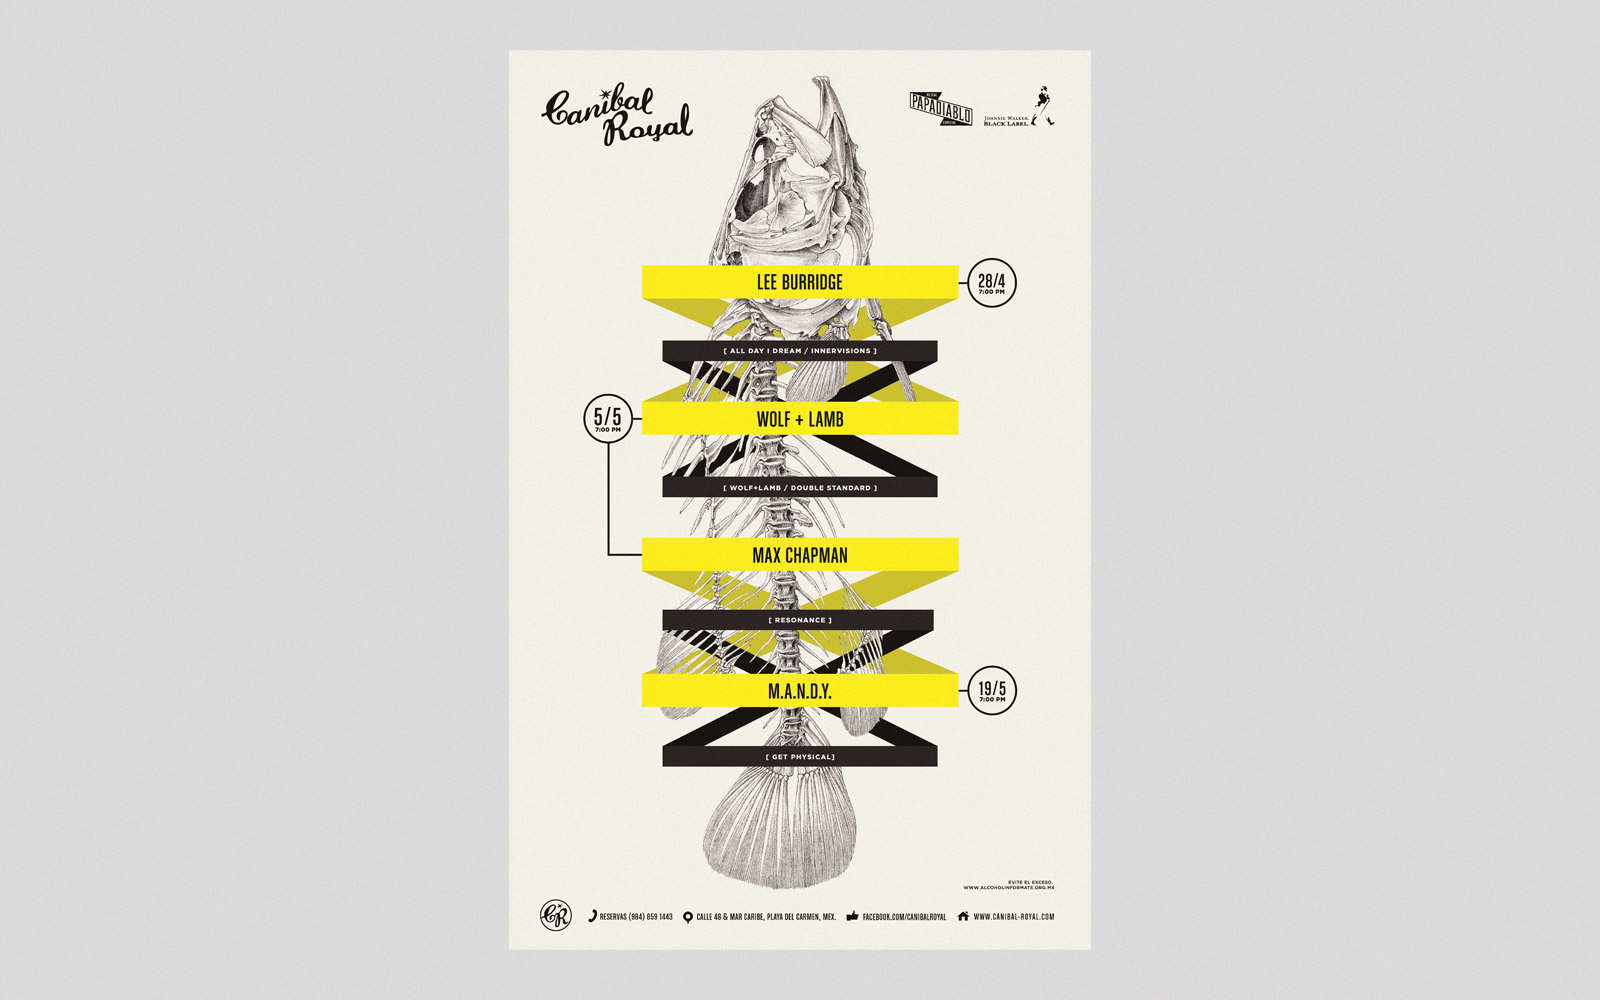 Canibal_Royal_Poster_10